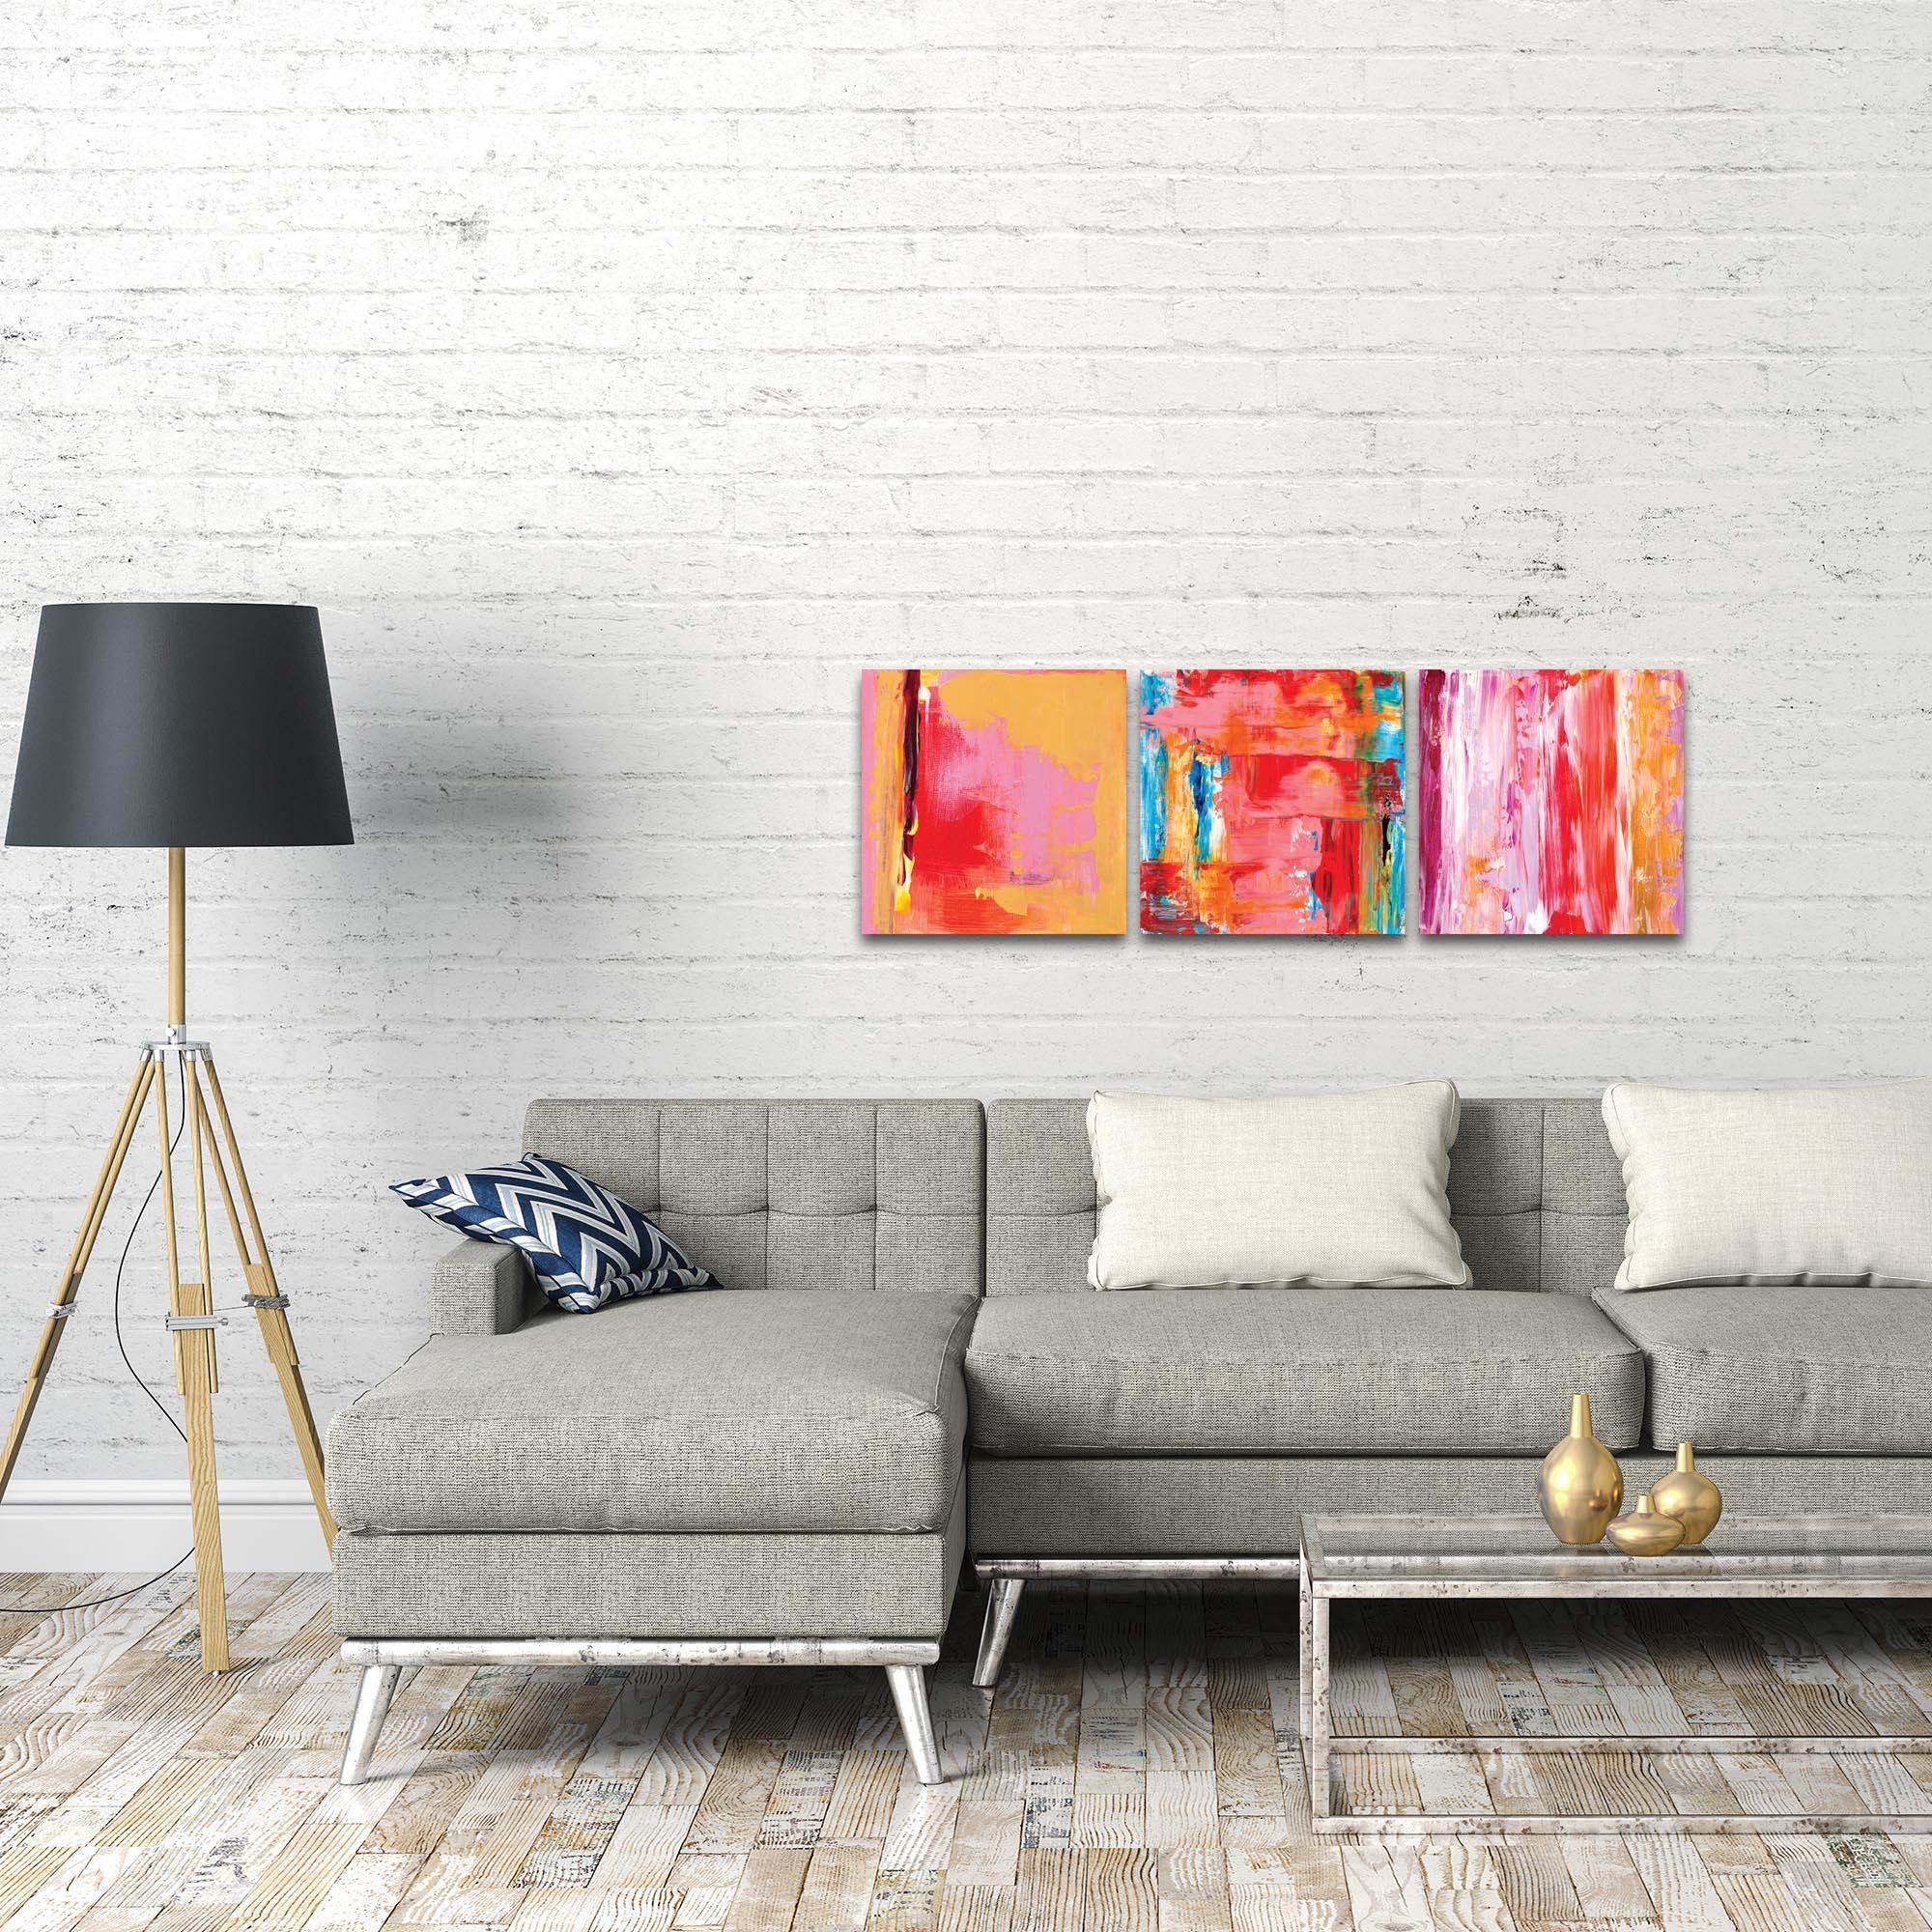 Abstract Wall Art 'Urban Triptych 3' - Urban Decor on Metal or Plexiglass - Lifestyle View